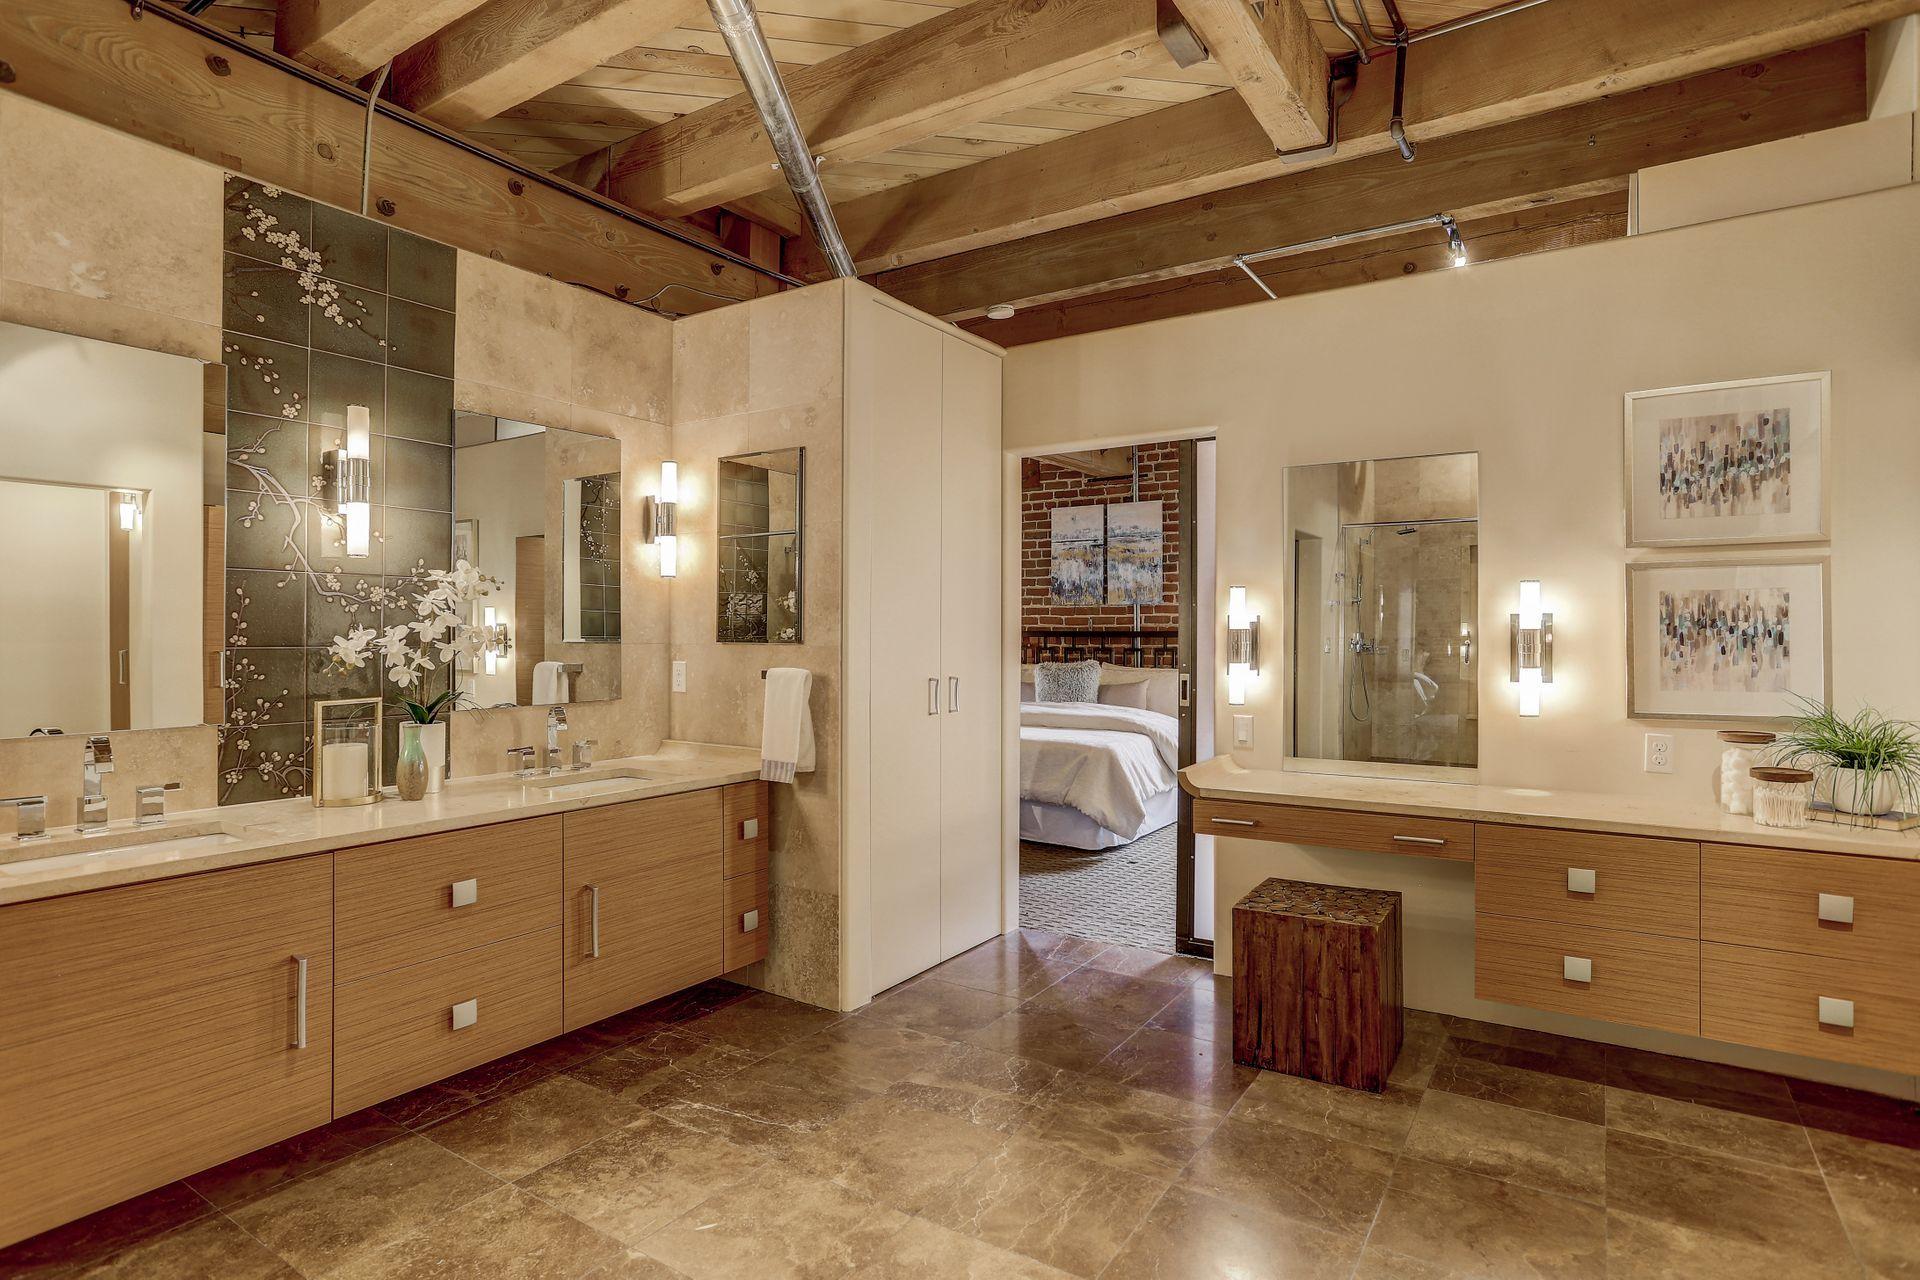 1792 Wynkoop Street, #502 bathroom